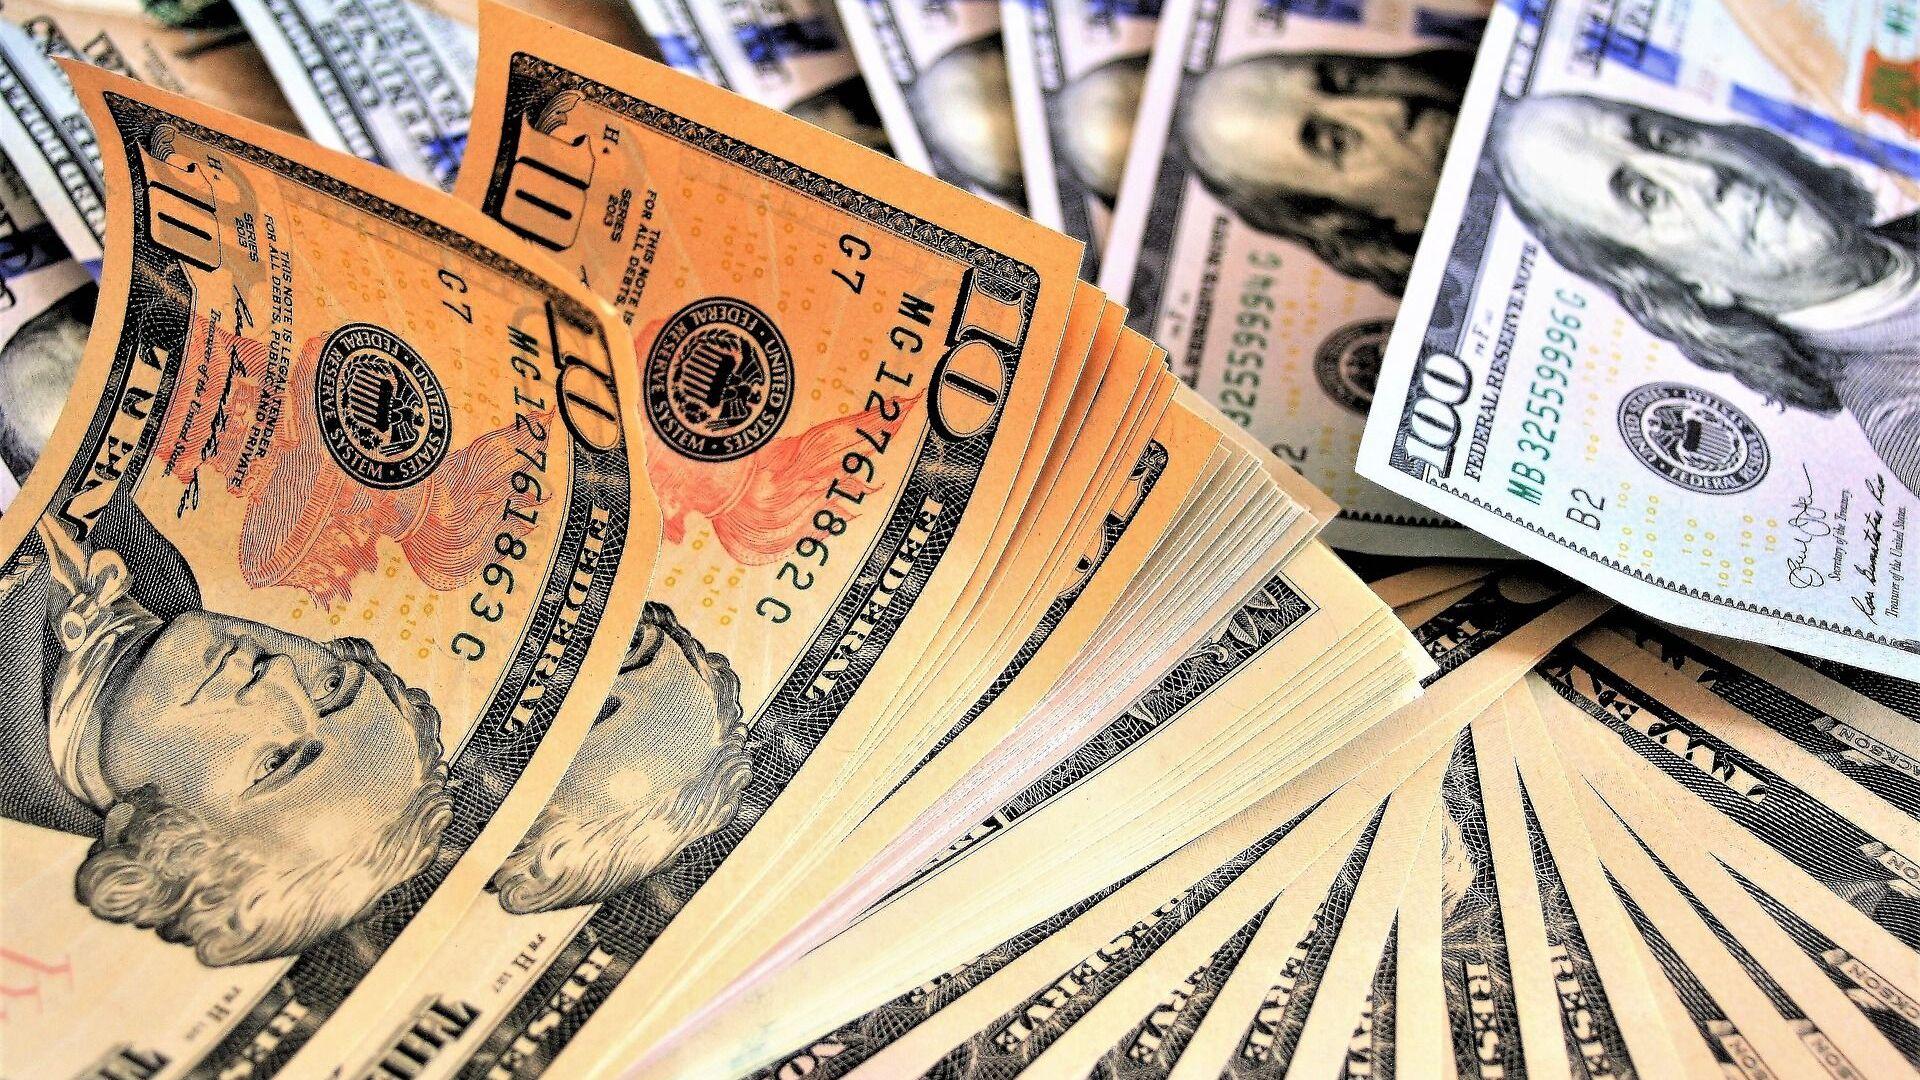 Доллары США - Sputnik Таджикистан, 1920, 04.06.2021